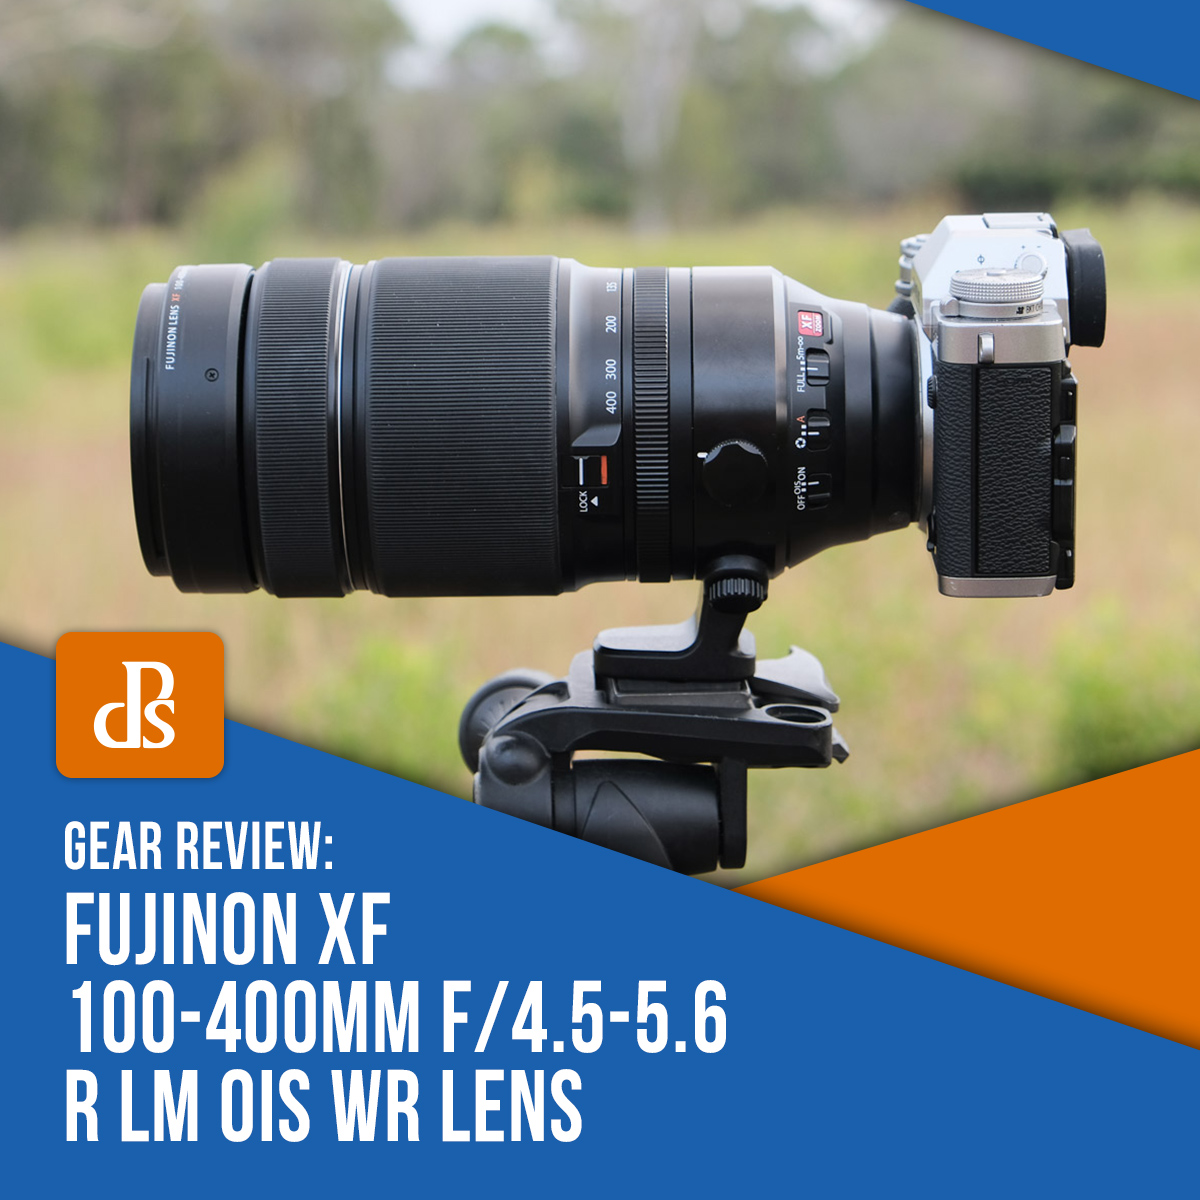 fujinon-XF-100-400mm-lens-review